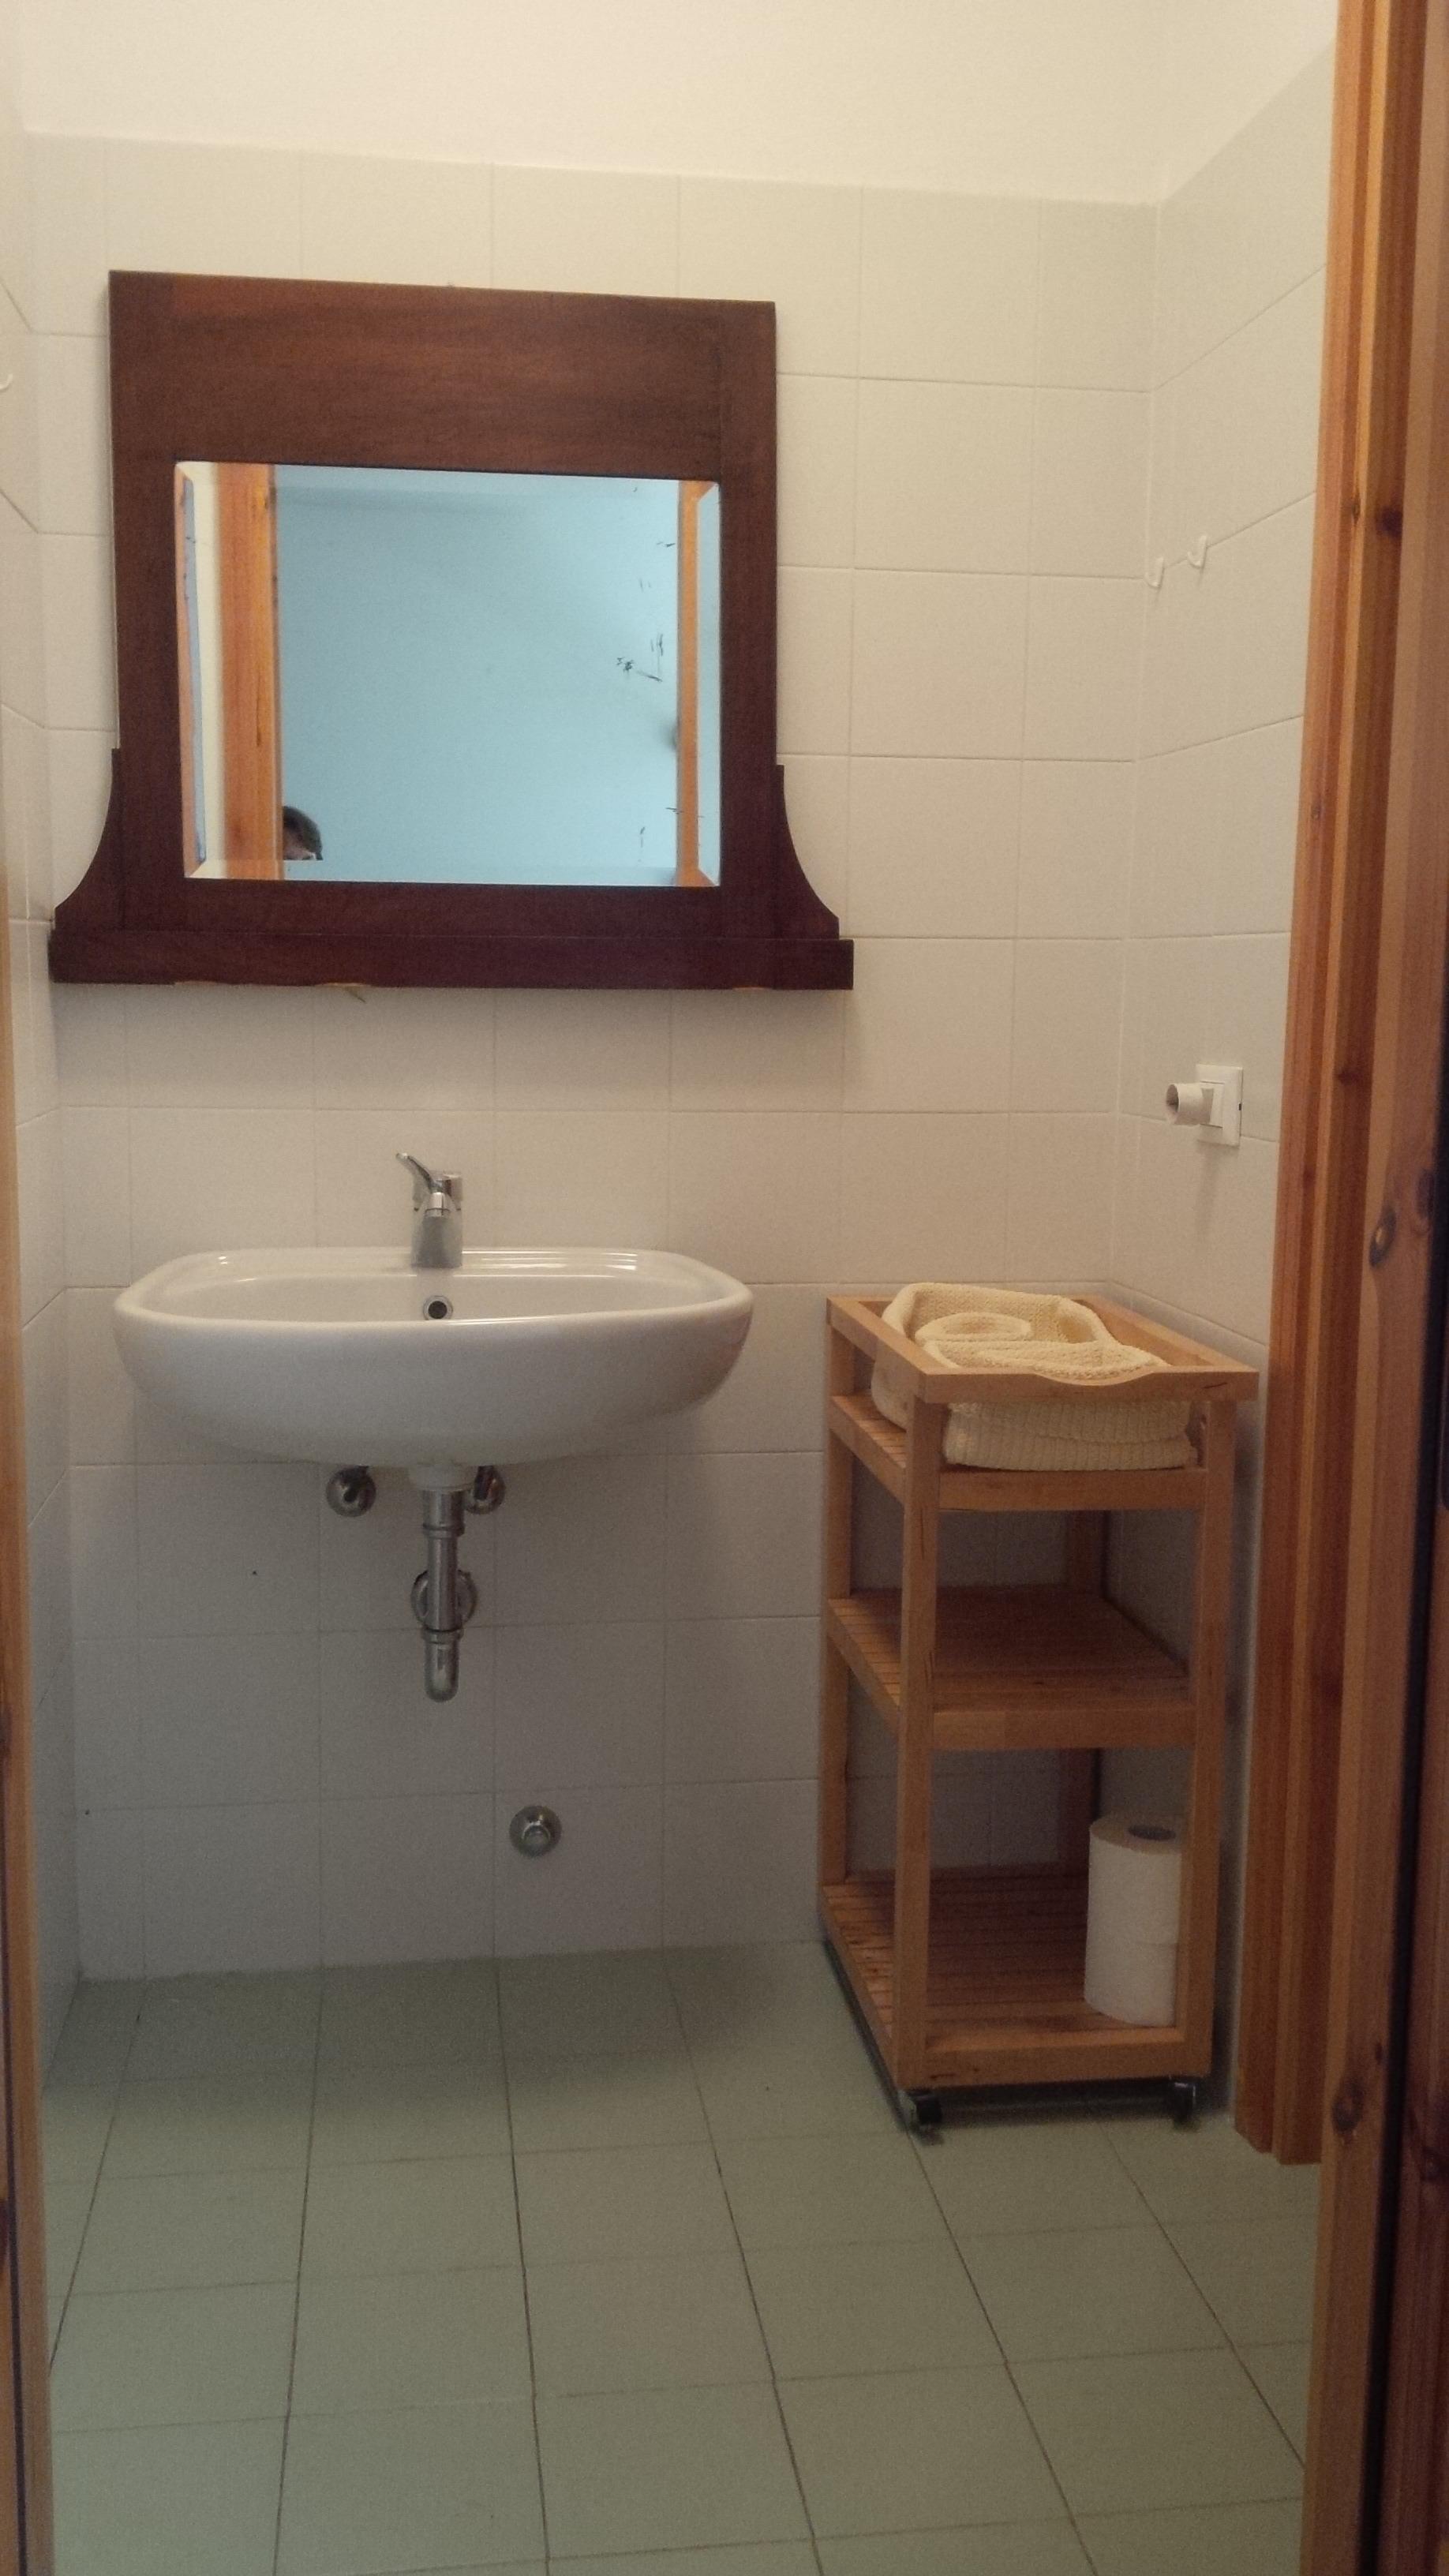 bagno rondinella 3.jpg